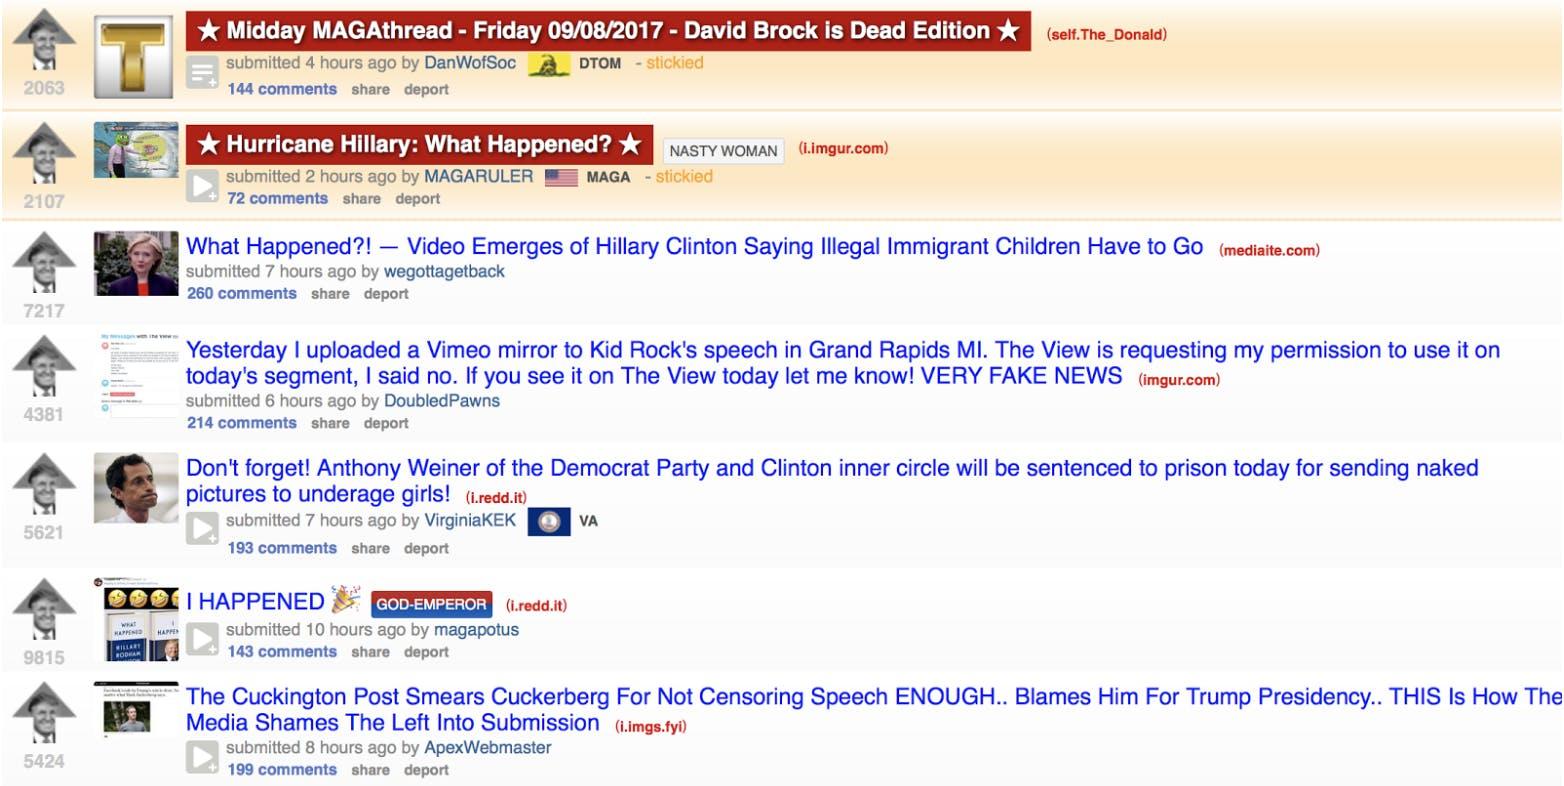 Reddit's The Donald